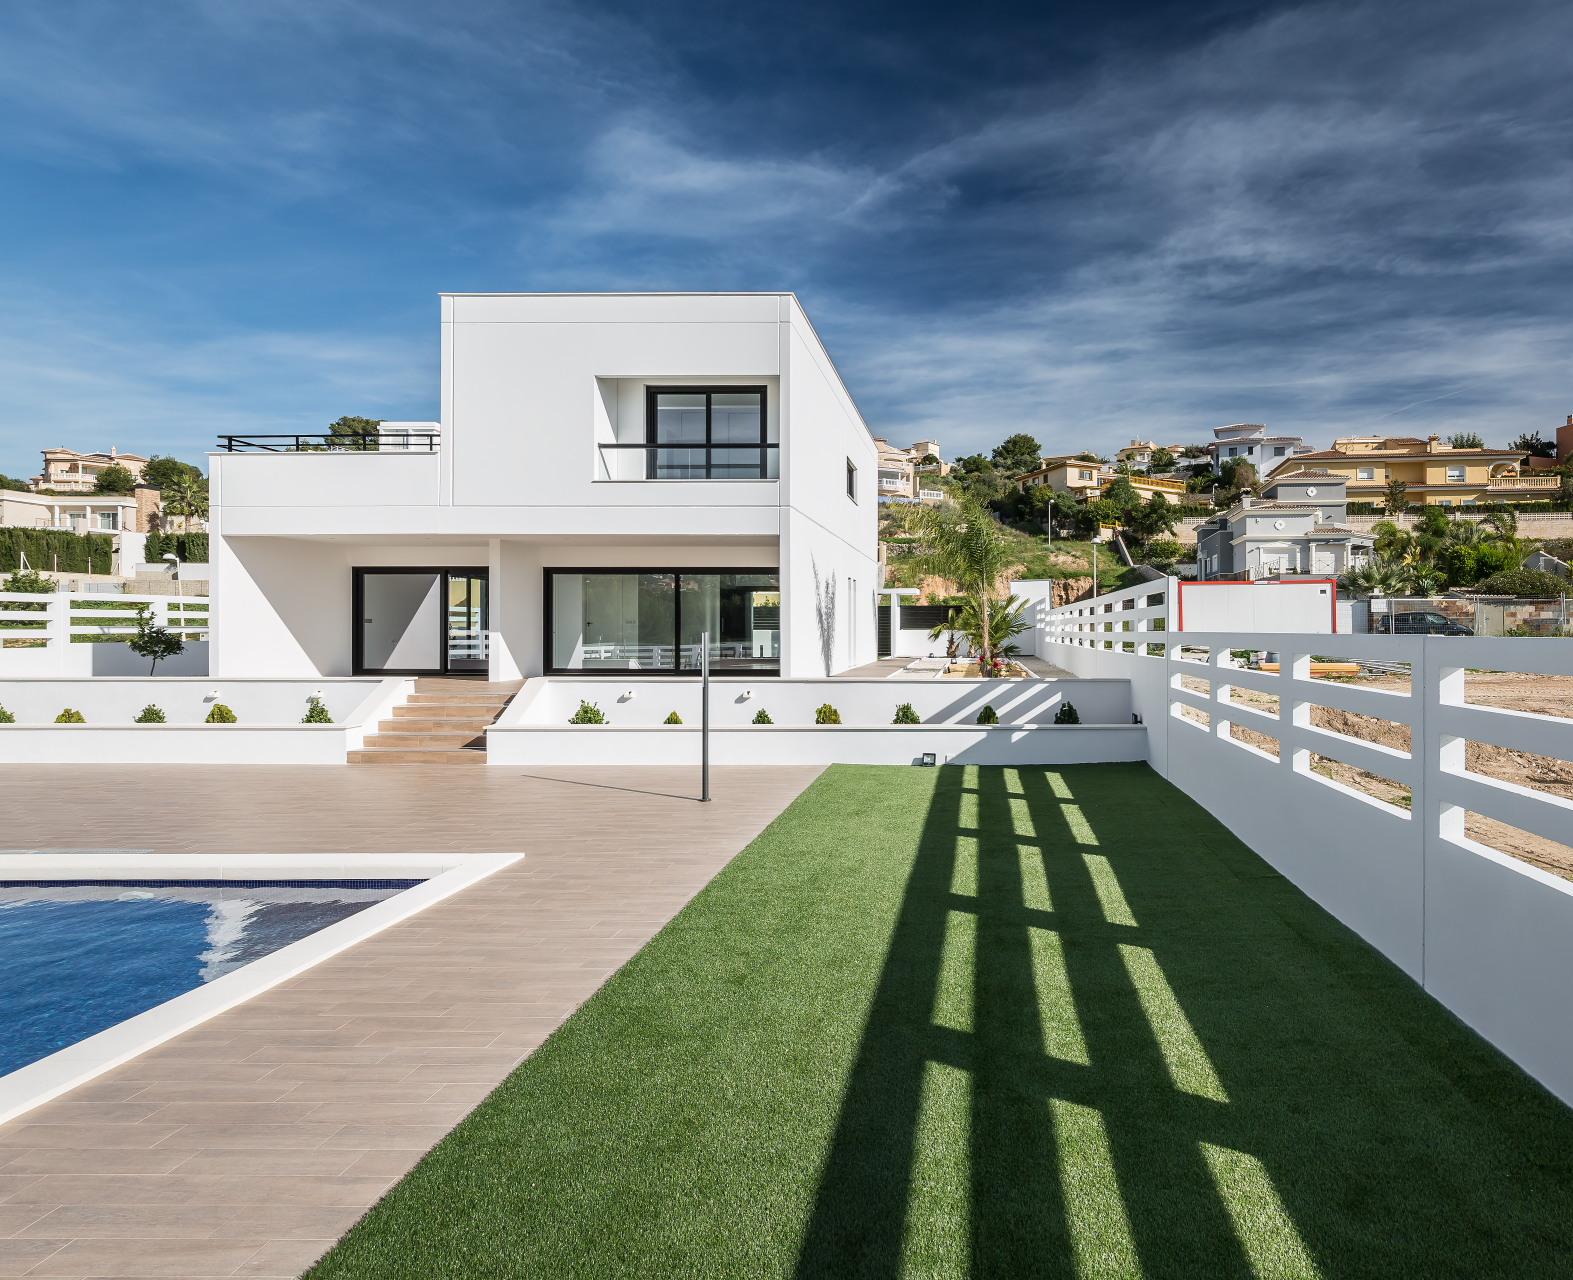 fotografia-arquitectura-valencia-german-cabo-viraje-vivienda-unifamiliar-calpe (6)